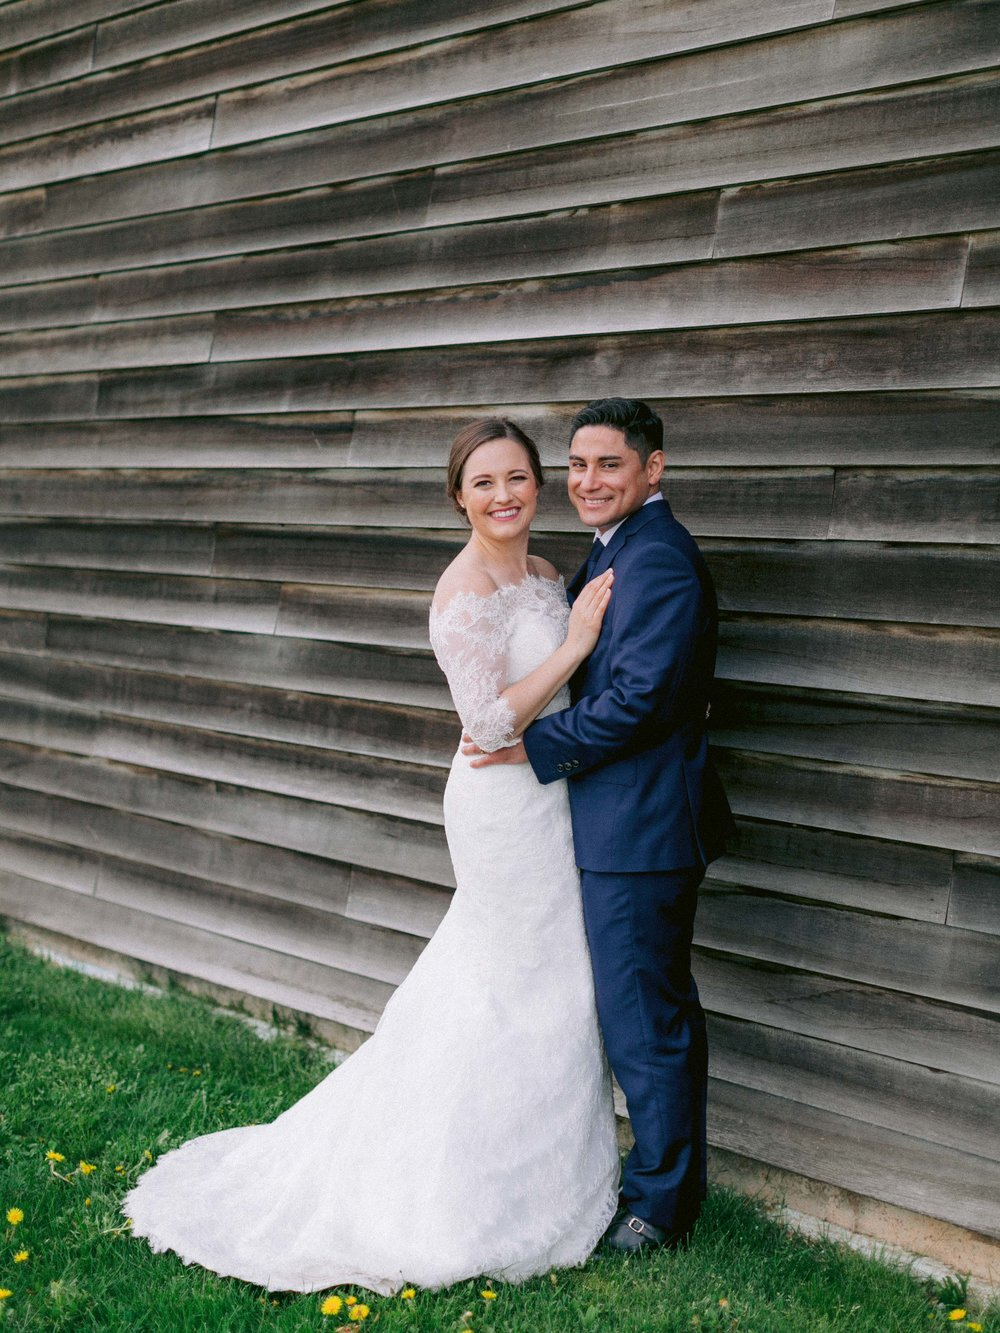 Niagara_on_the_lake_spring_wedding_kurtz_orpia_toronto_Vineyard_wedding_fine_art (74 of 92).jpg